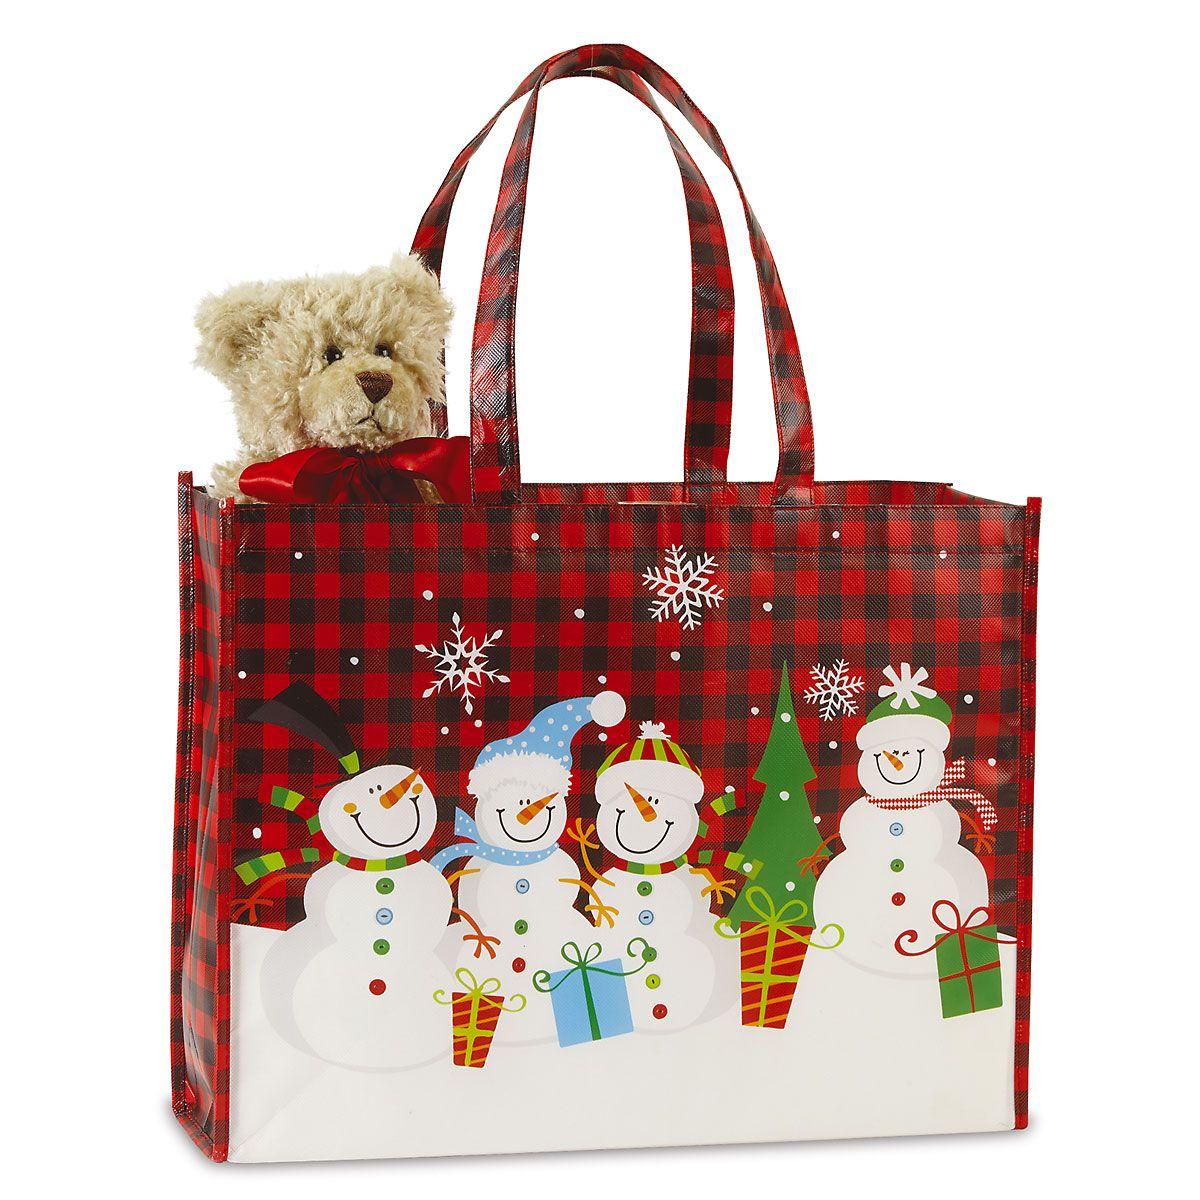 Snowman Plaid Shopping Tote - Buy 1 Get 1 Free